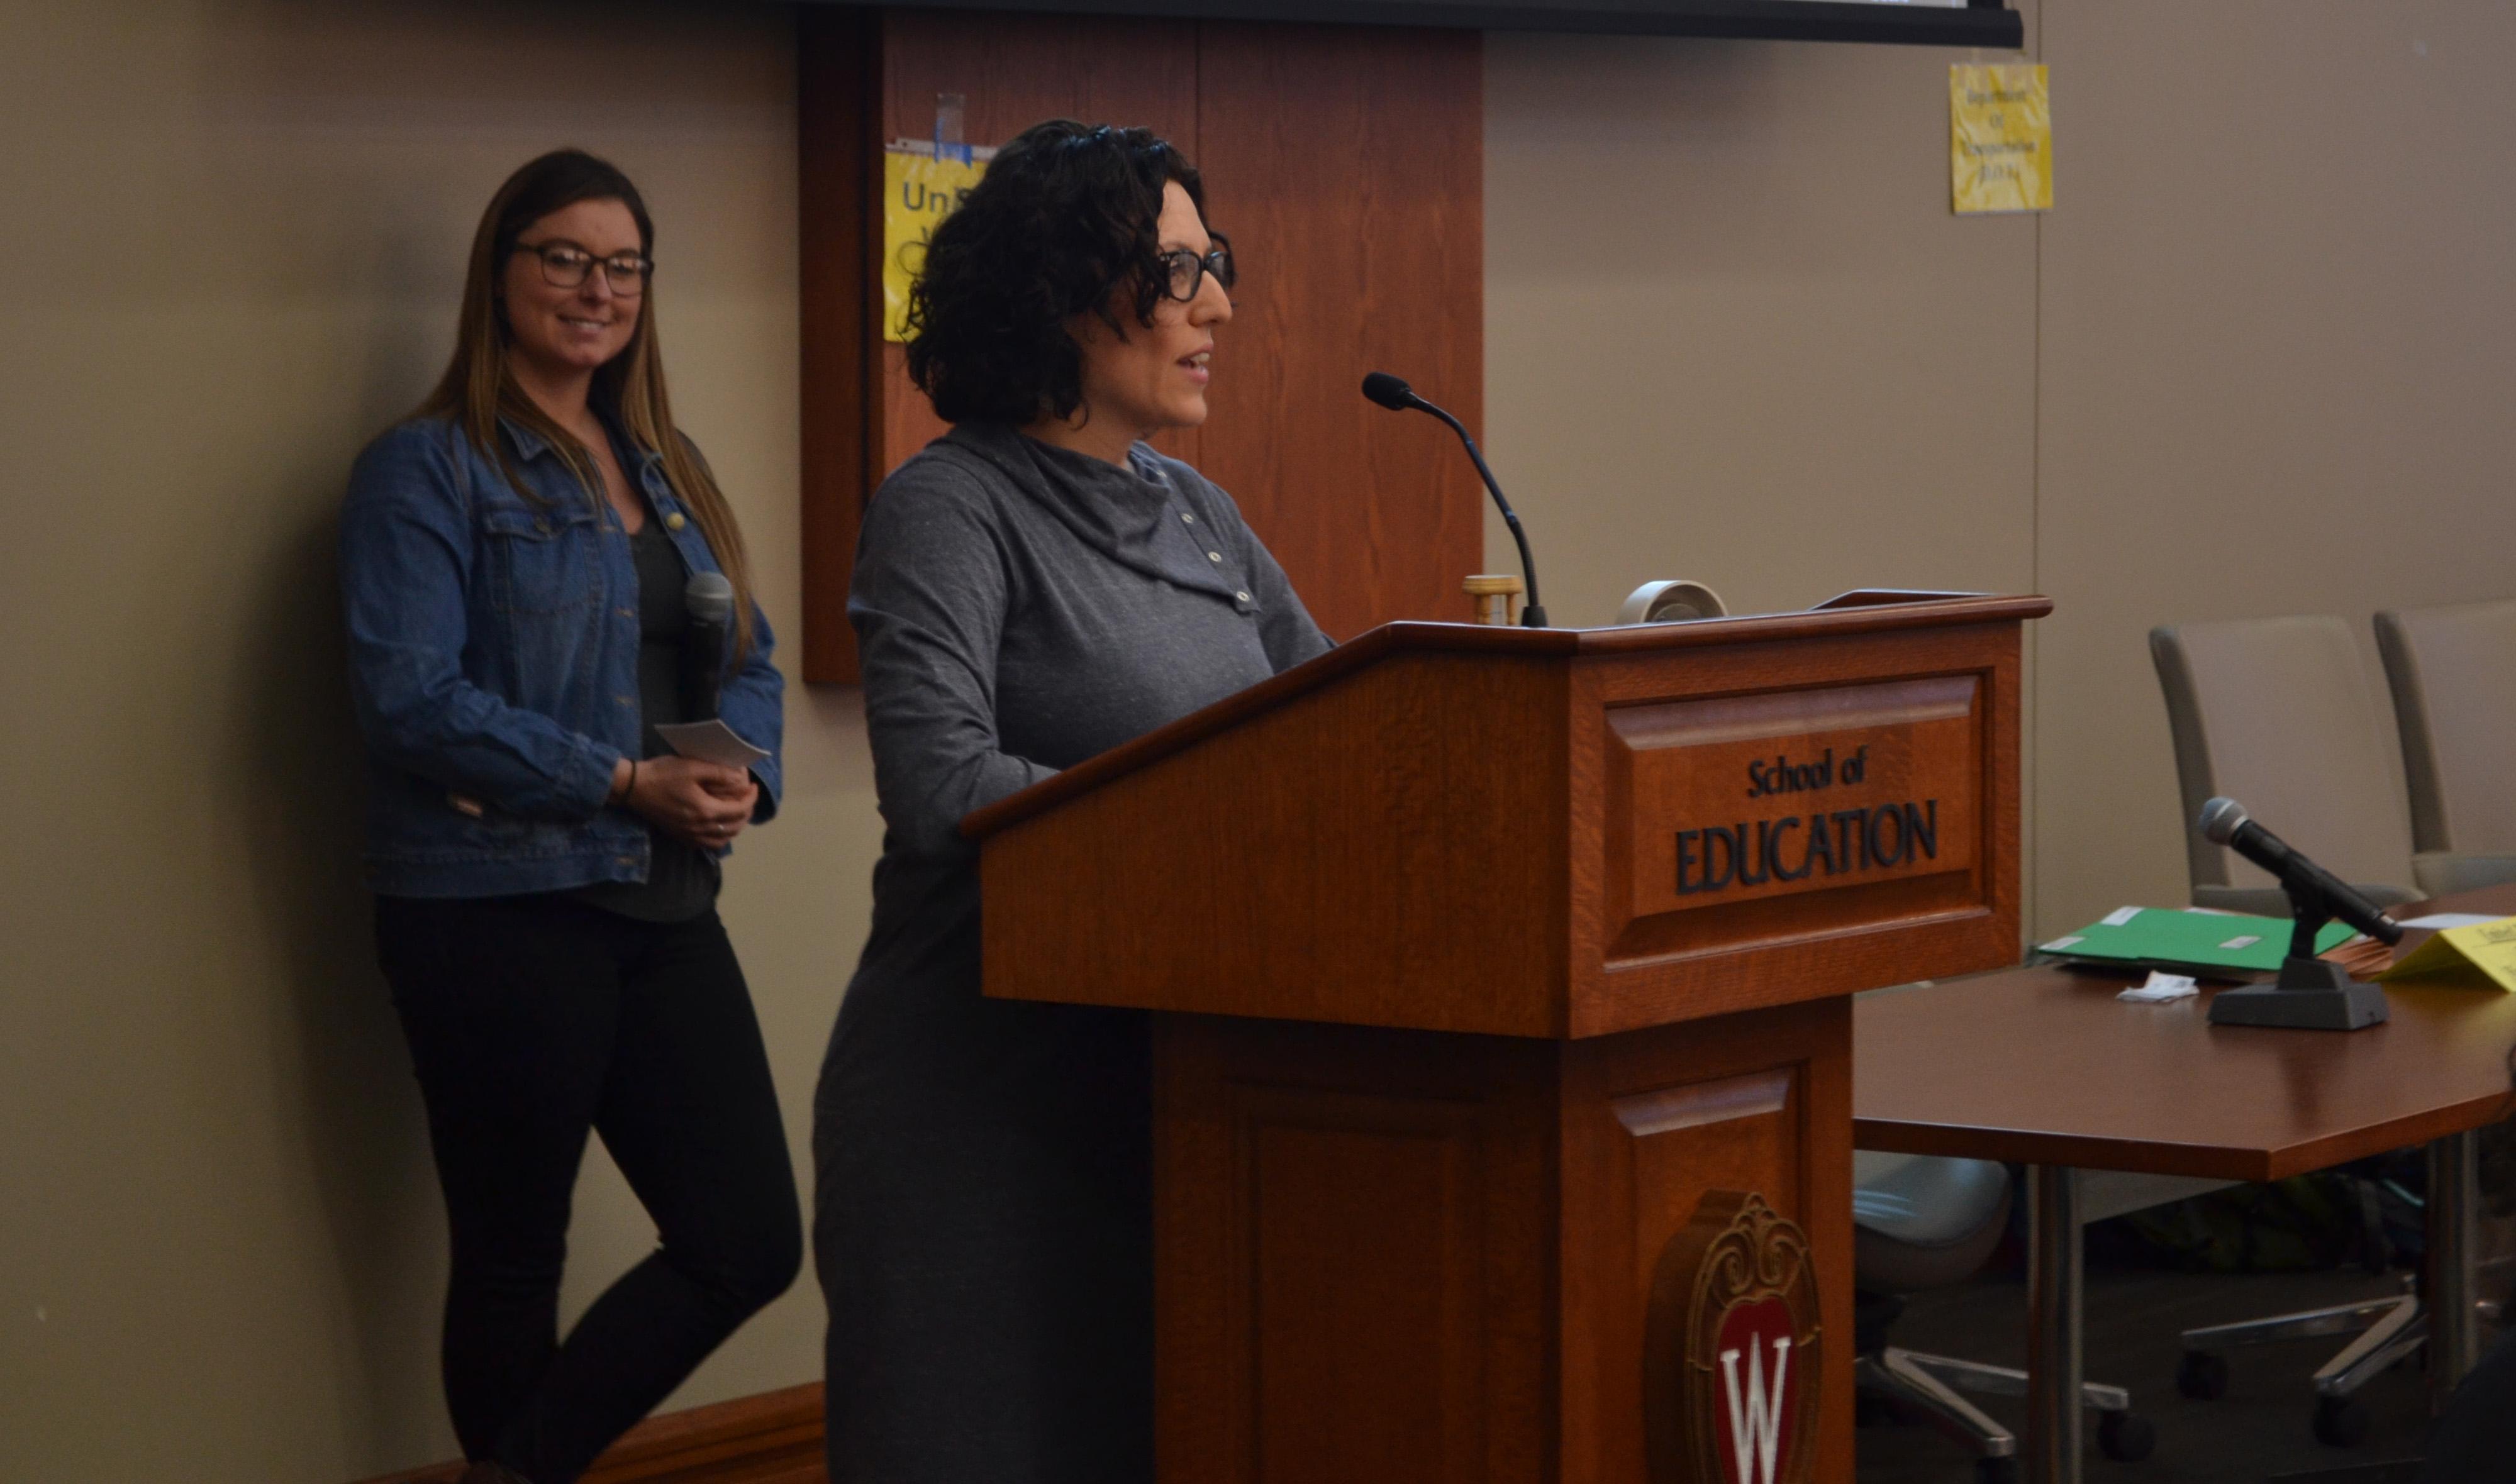 Pajarita Charles (at lectern) and Shawna Lutzow of Madison-area Urban Ministry